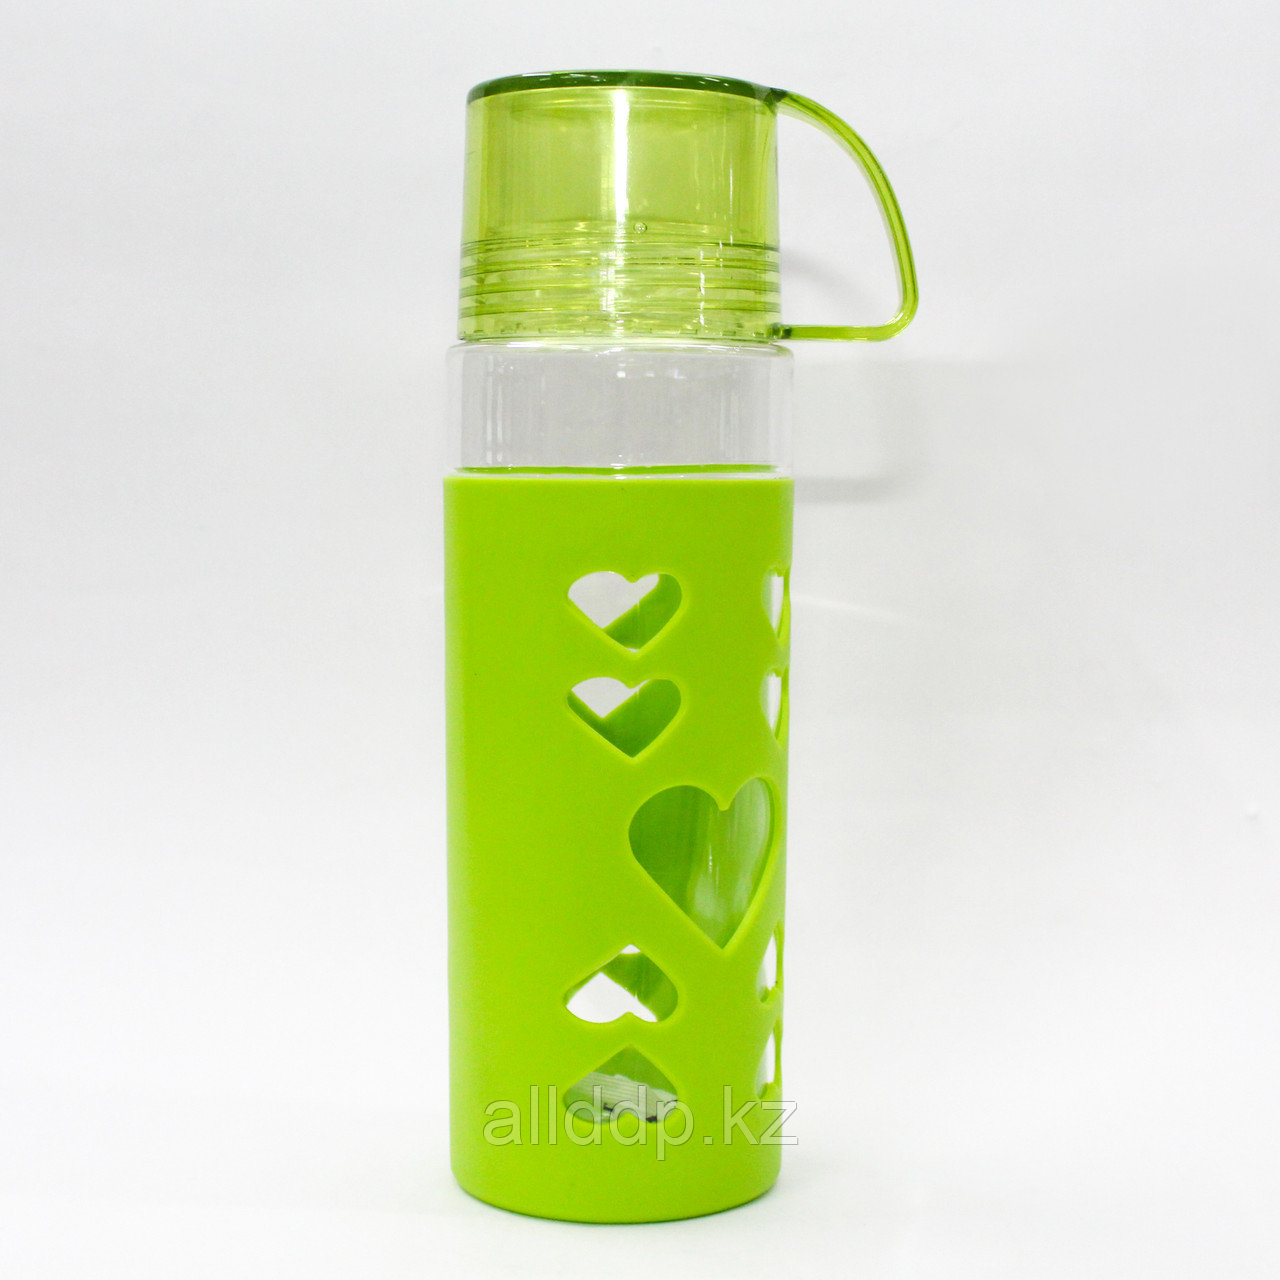 Эко бутылка для воды со стаканом, 0,5 л, зеленая